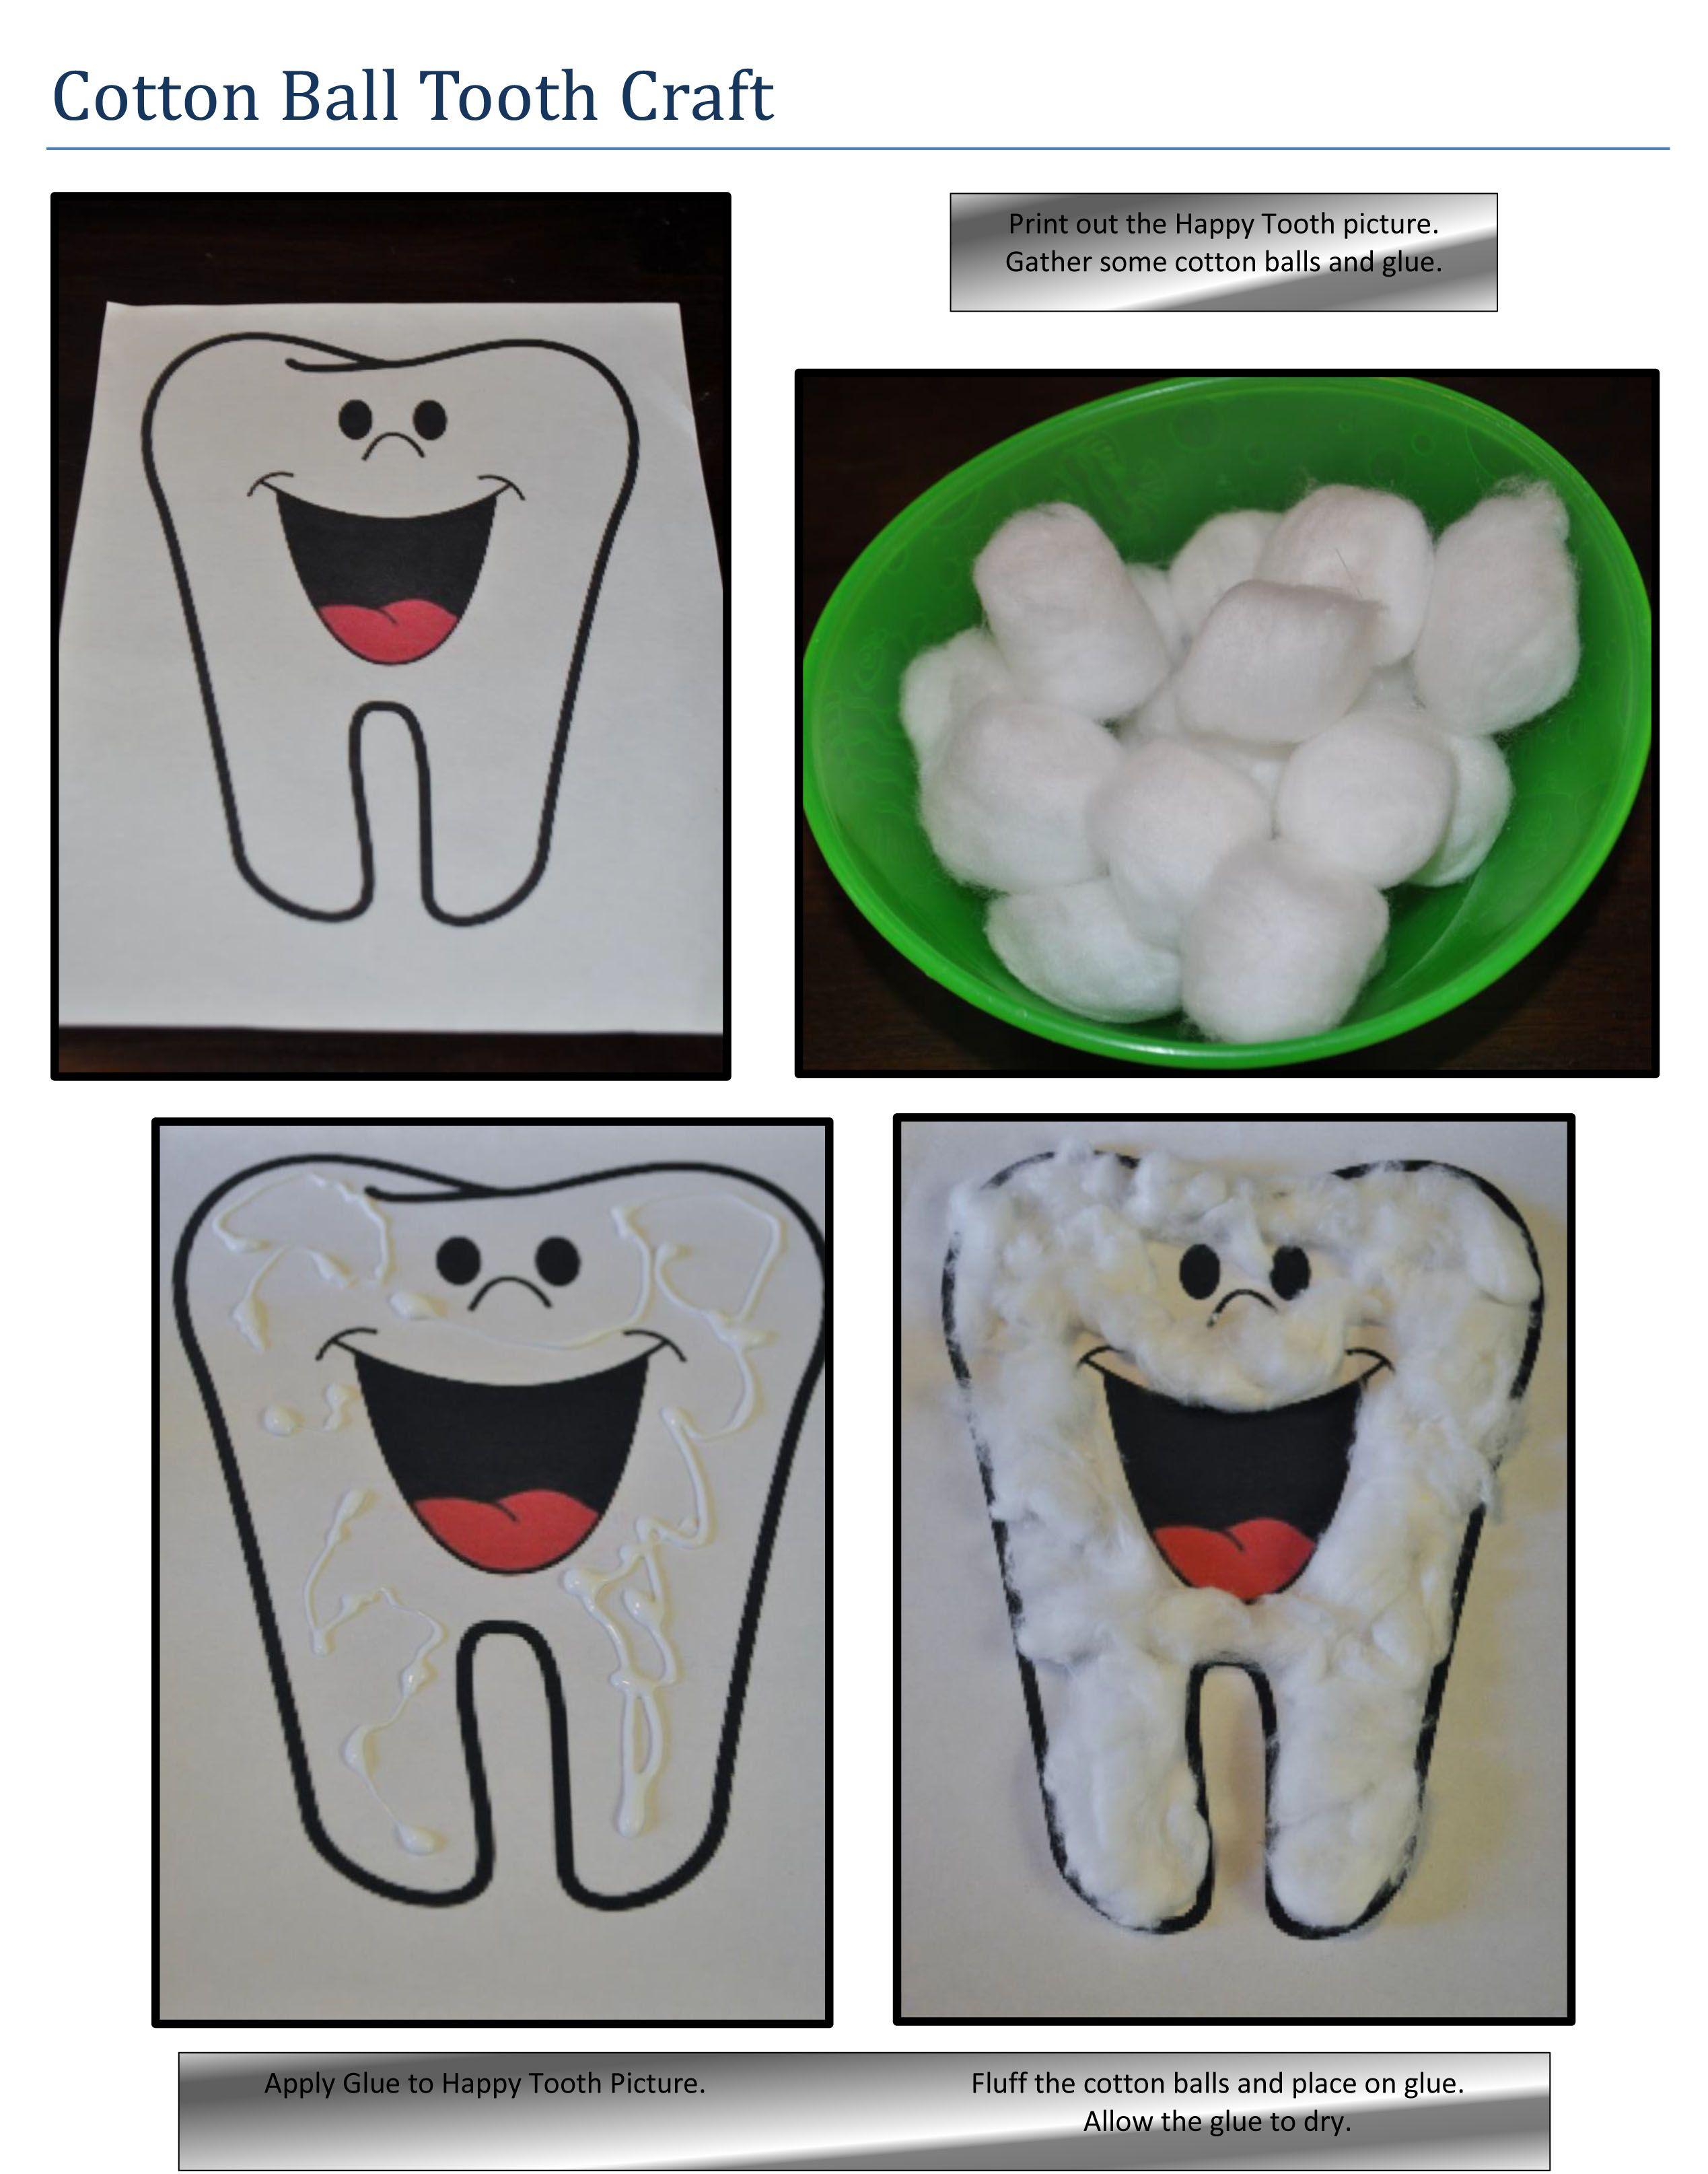 Cotton Ball Tooth Craft